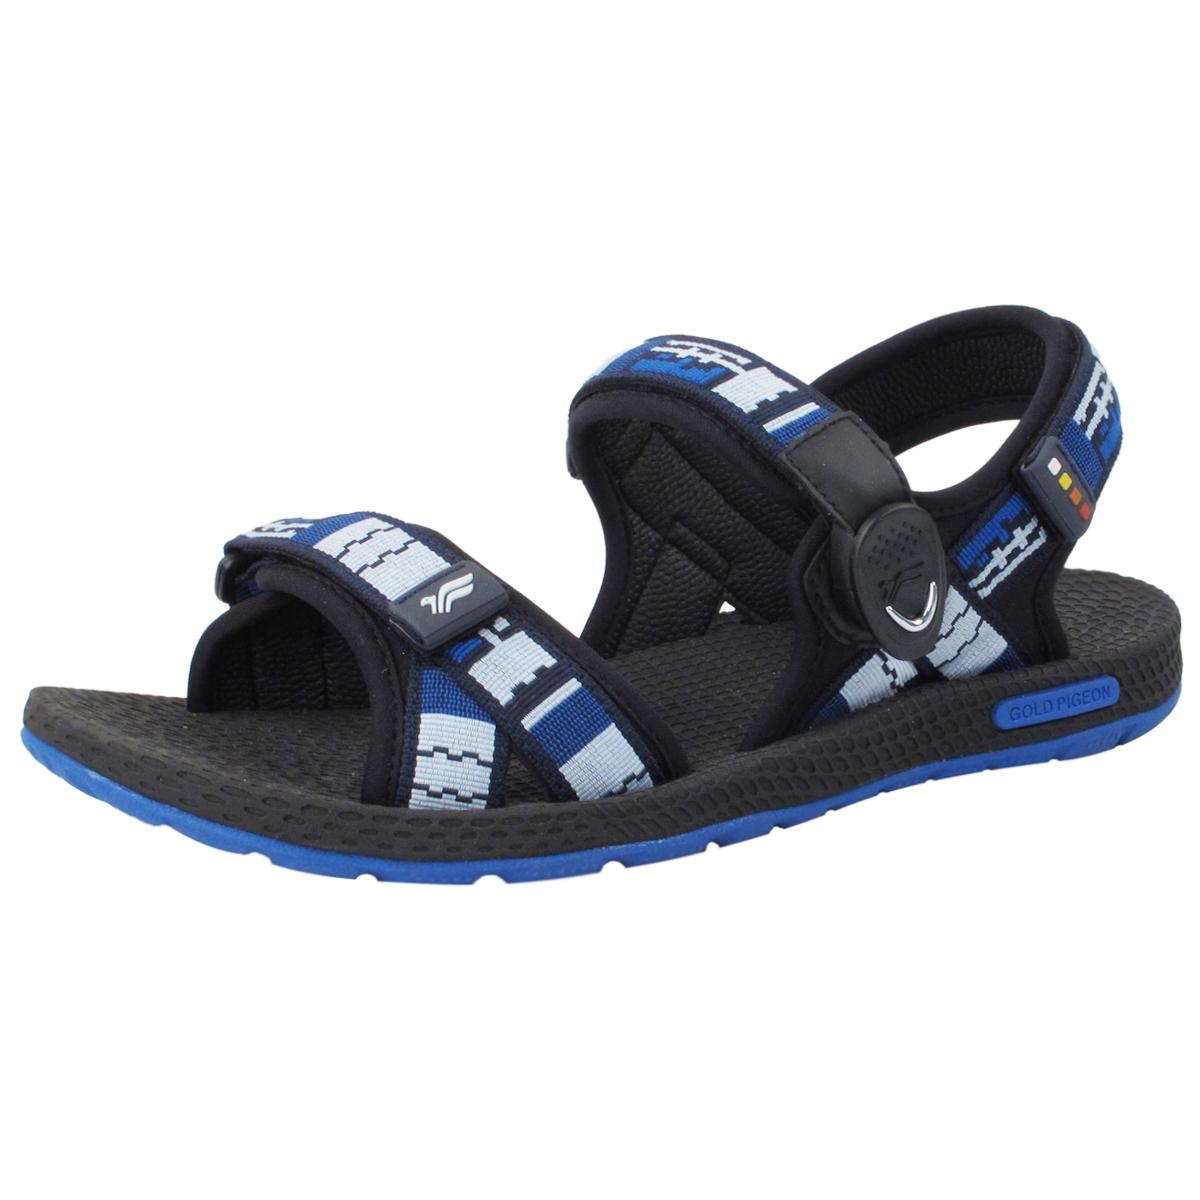 Simplus Snap Lock Sandal 8658m Blue Size Men 8 11